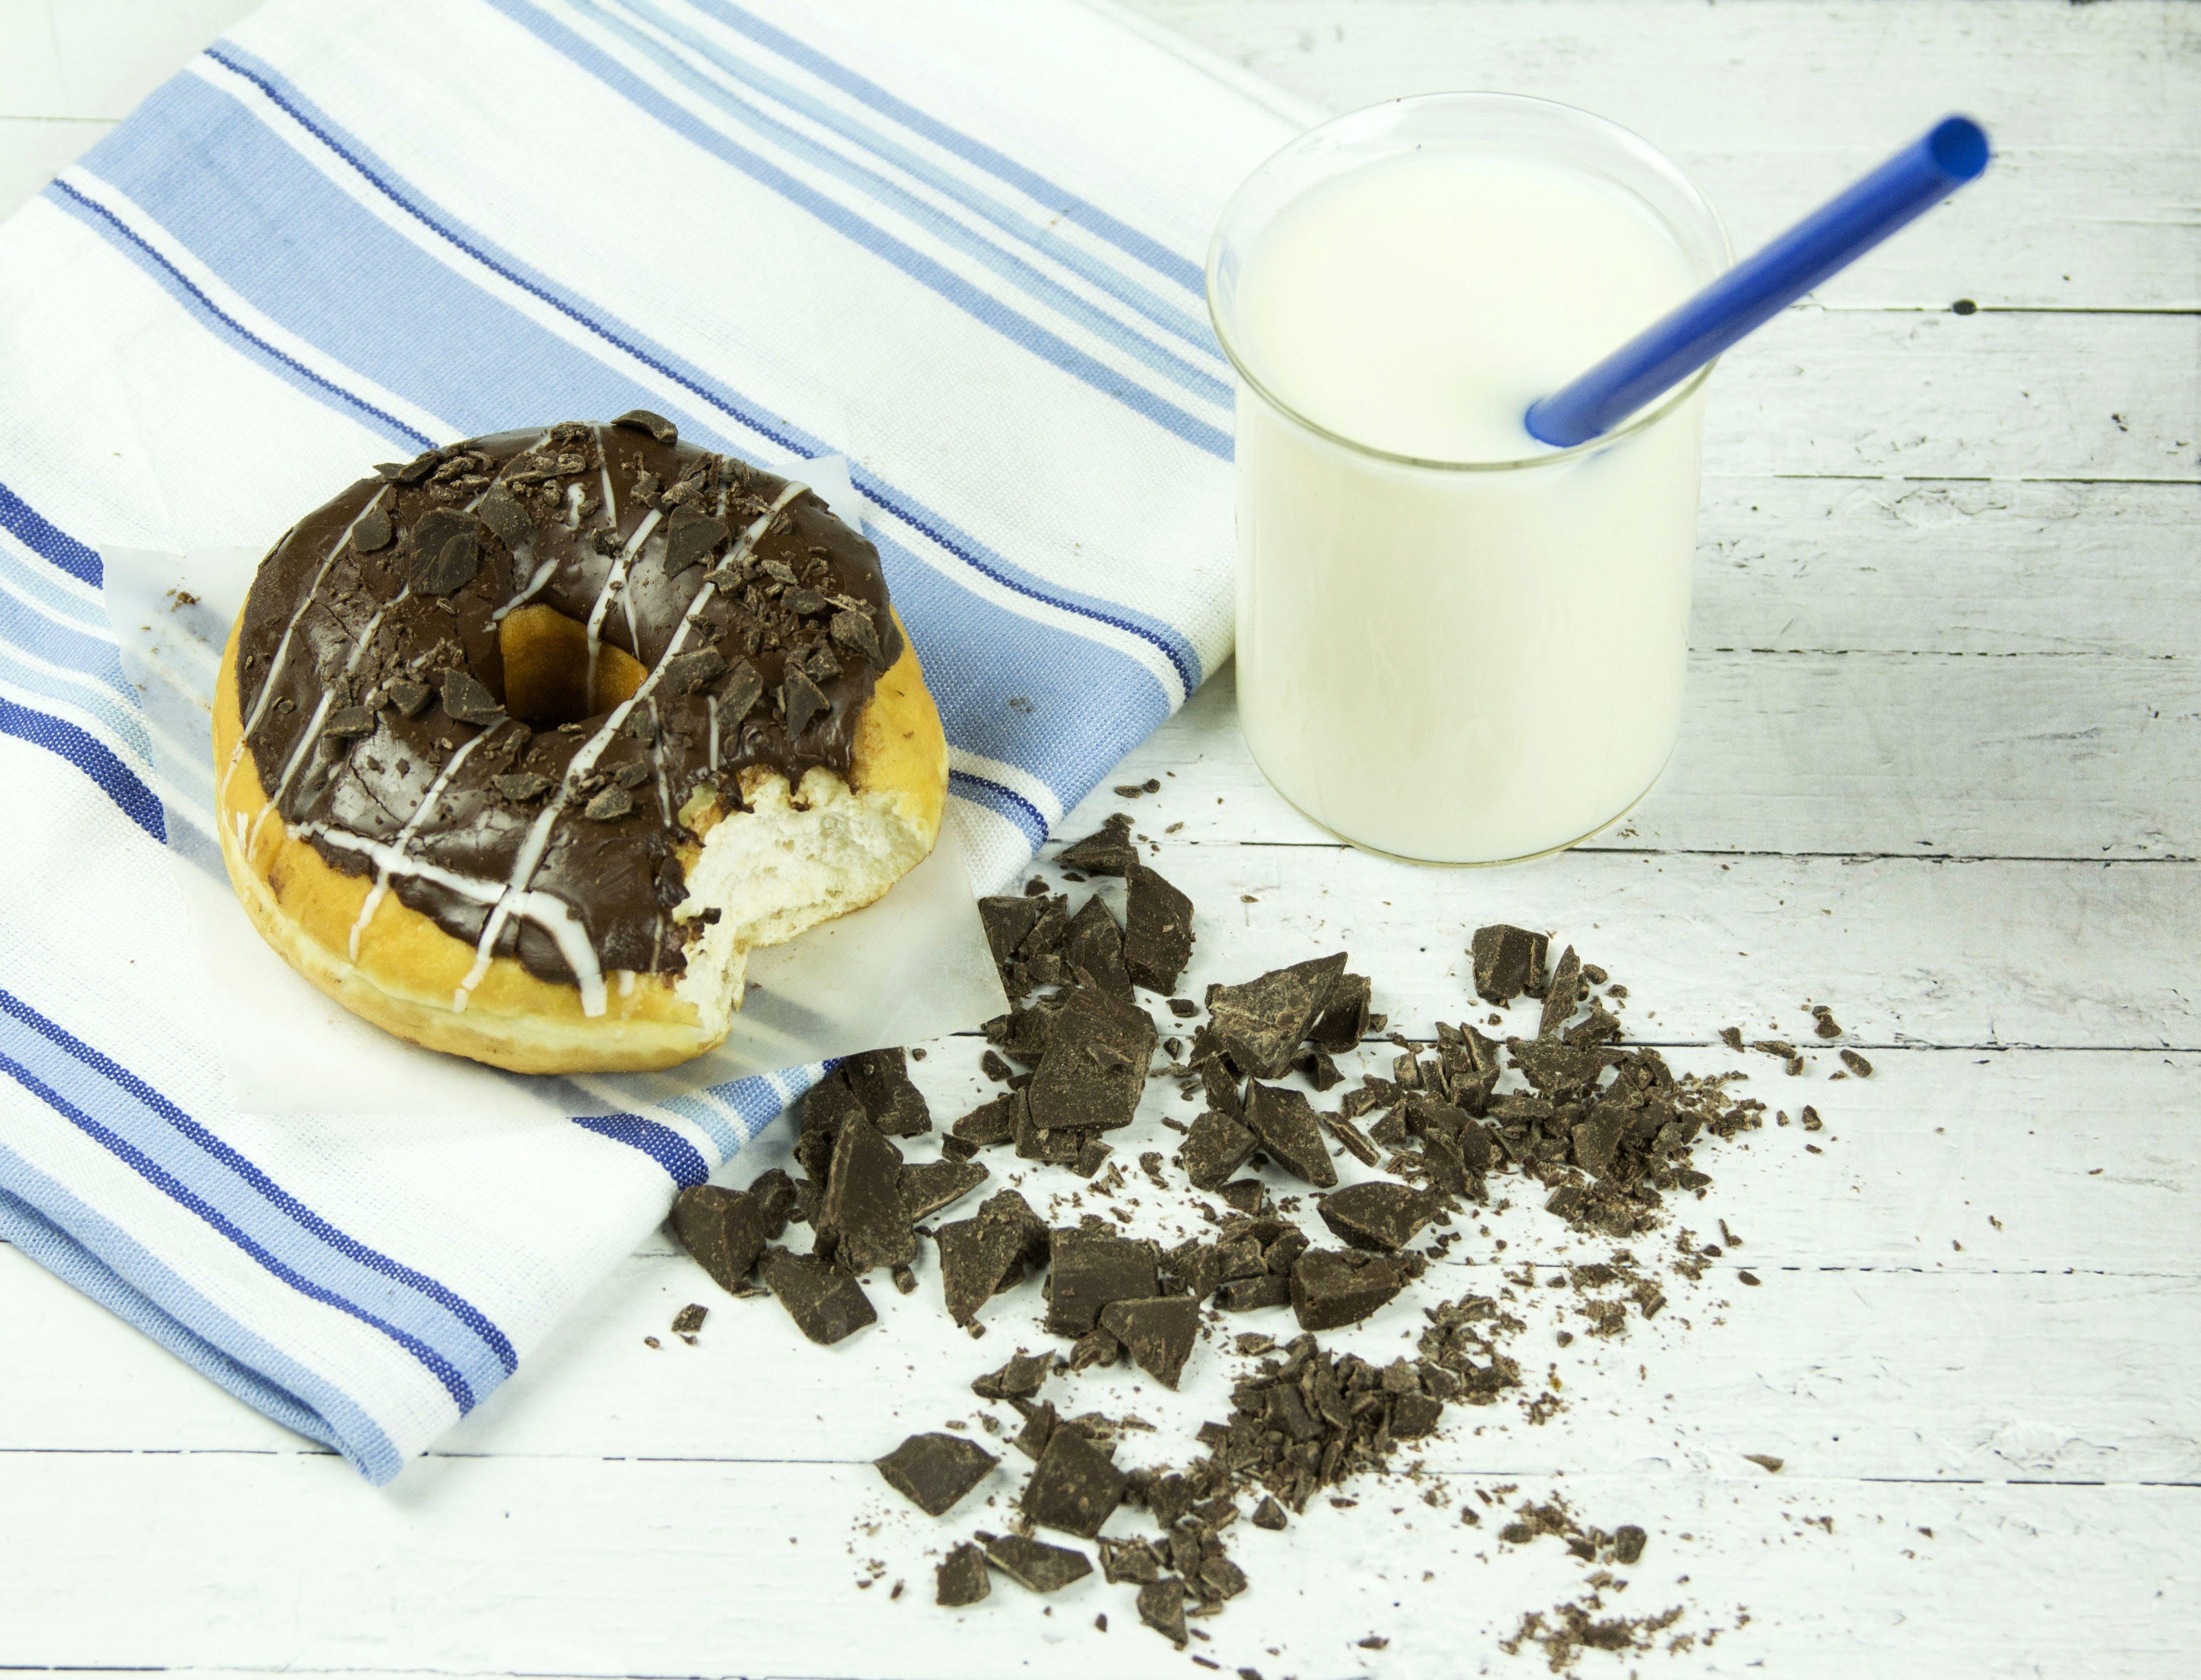 Chocolate Donut Beside Chunked Chocolates